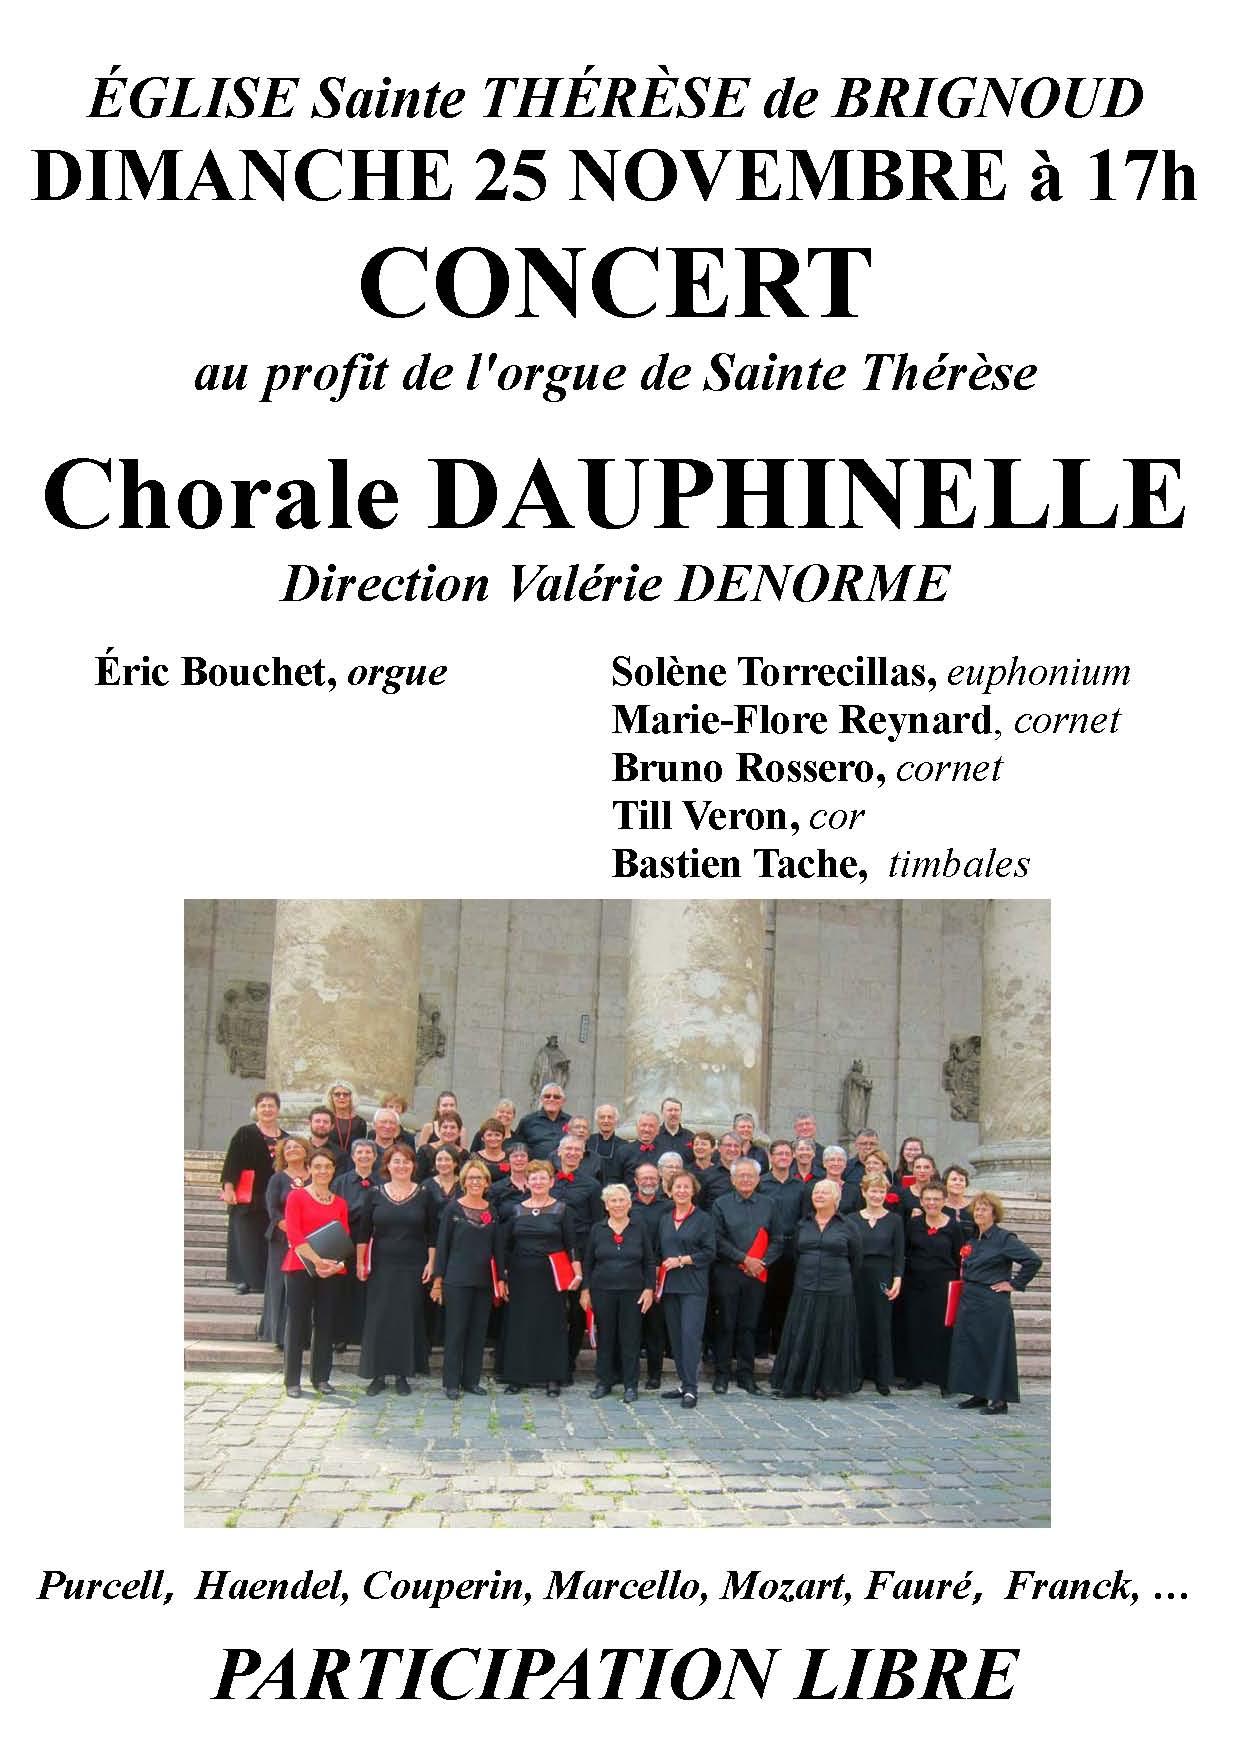 affiche-concert-dauphinelle-brignoud-25-nov-2018